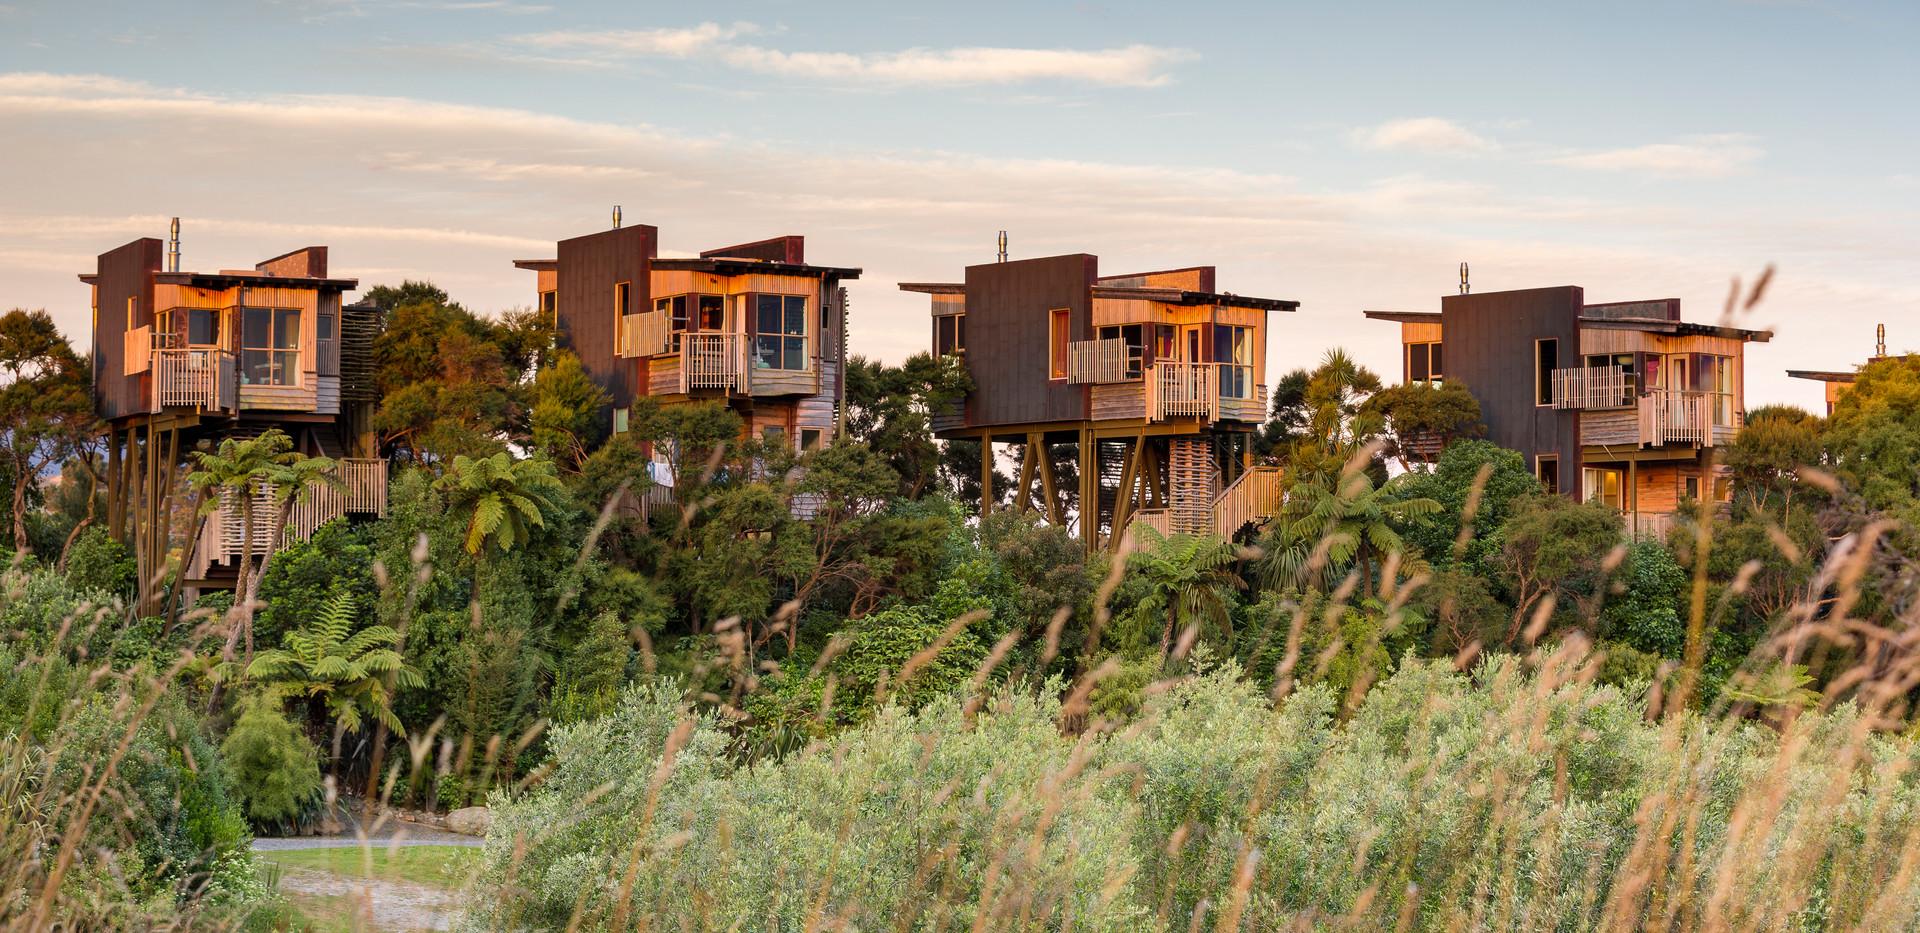 Hapuku Lodge Treehouses